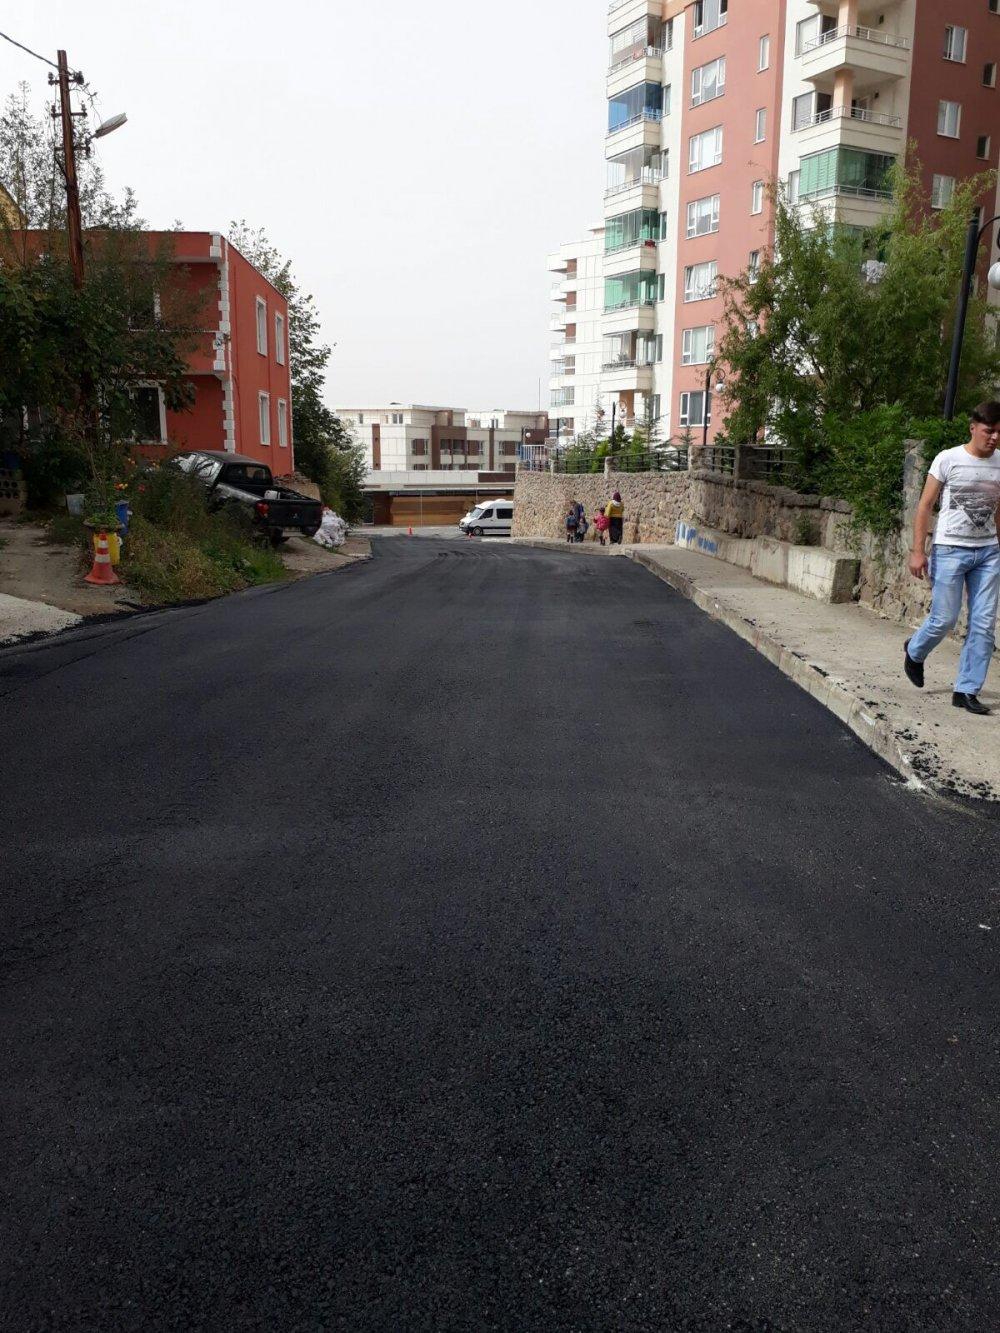 Trabzon'da 55 bin ton asfaltlama yapıldı